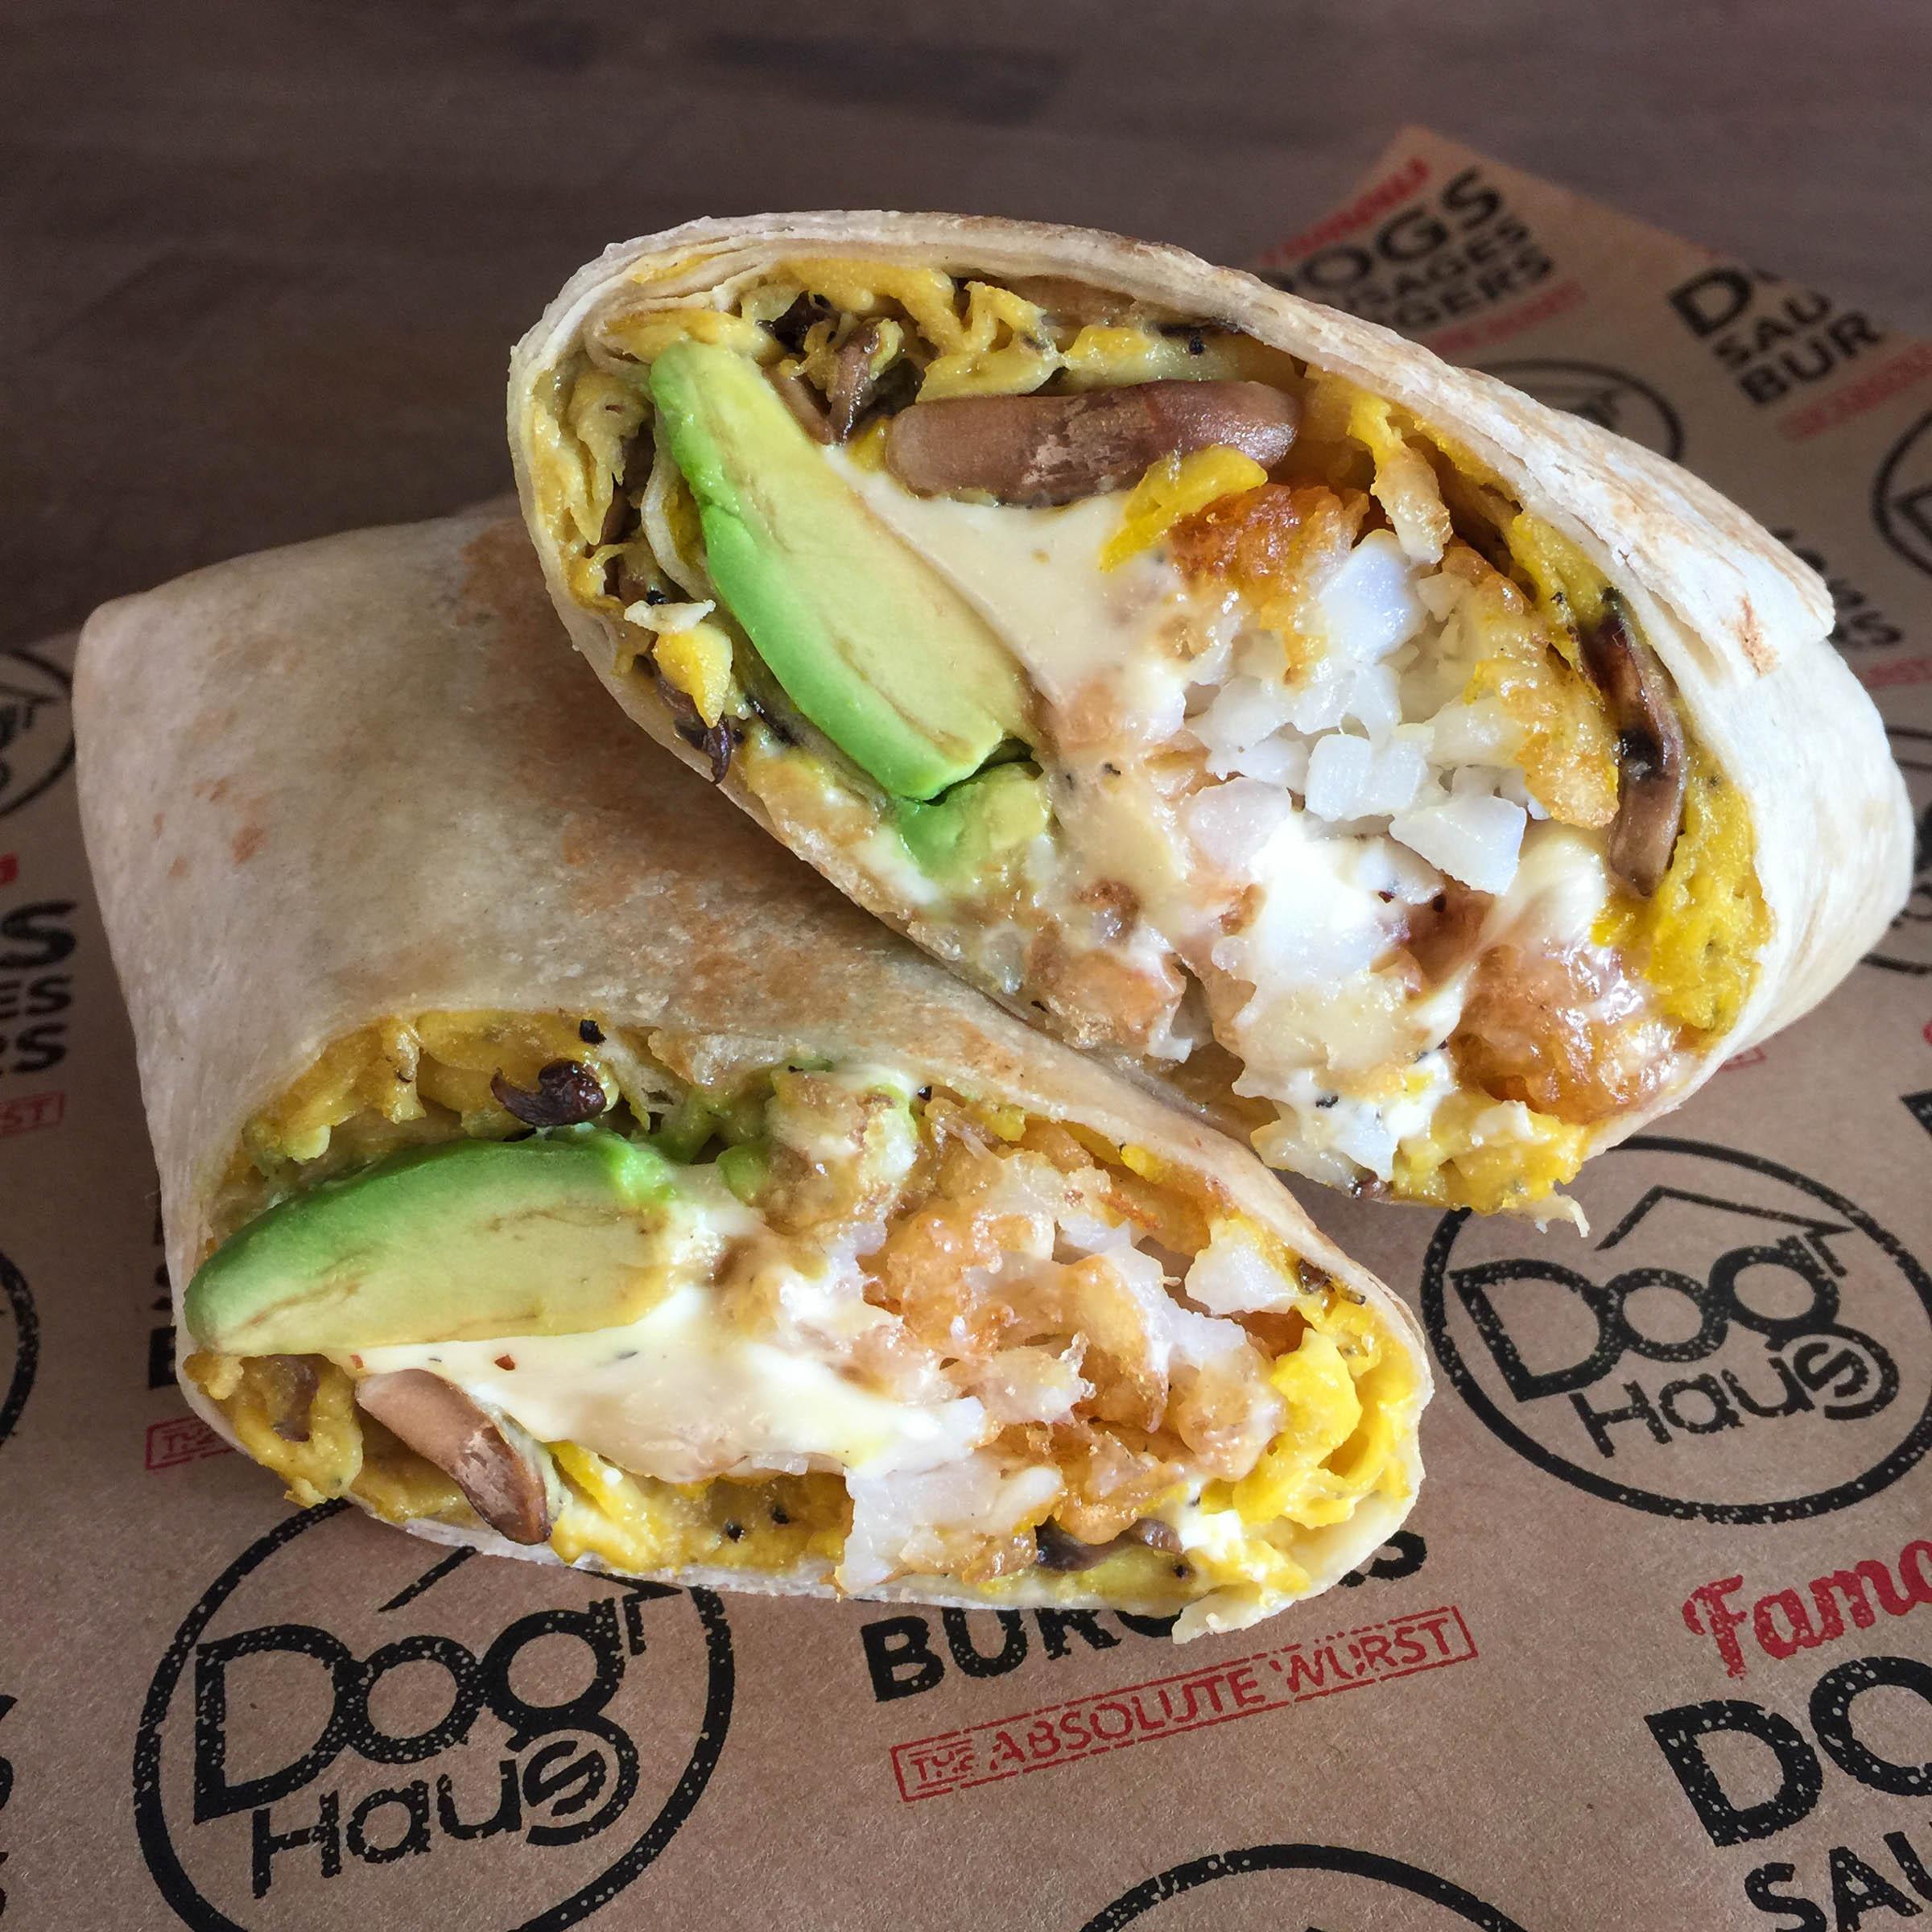 Veggie Breakfast Burrito - Photo courtesy of Dog Haus